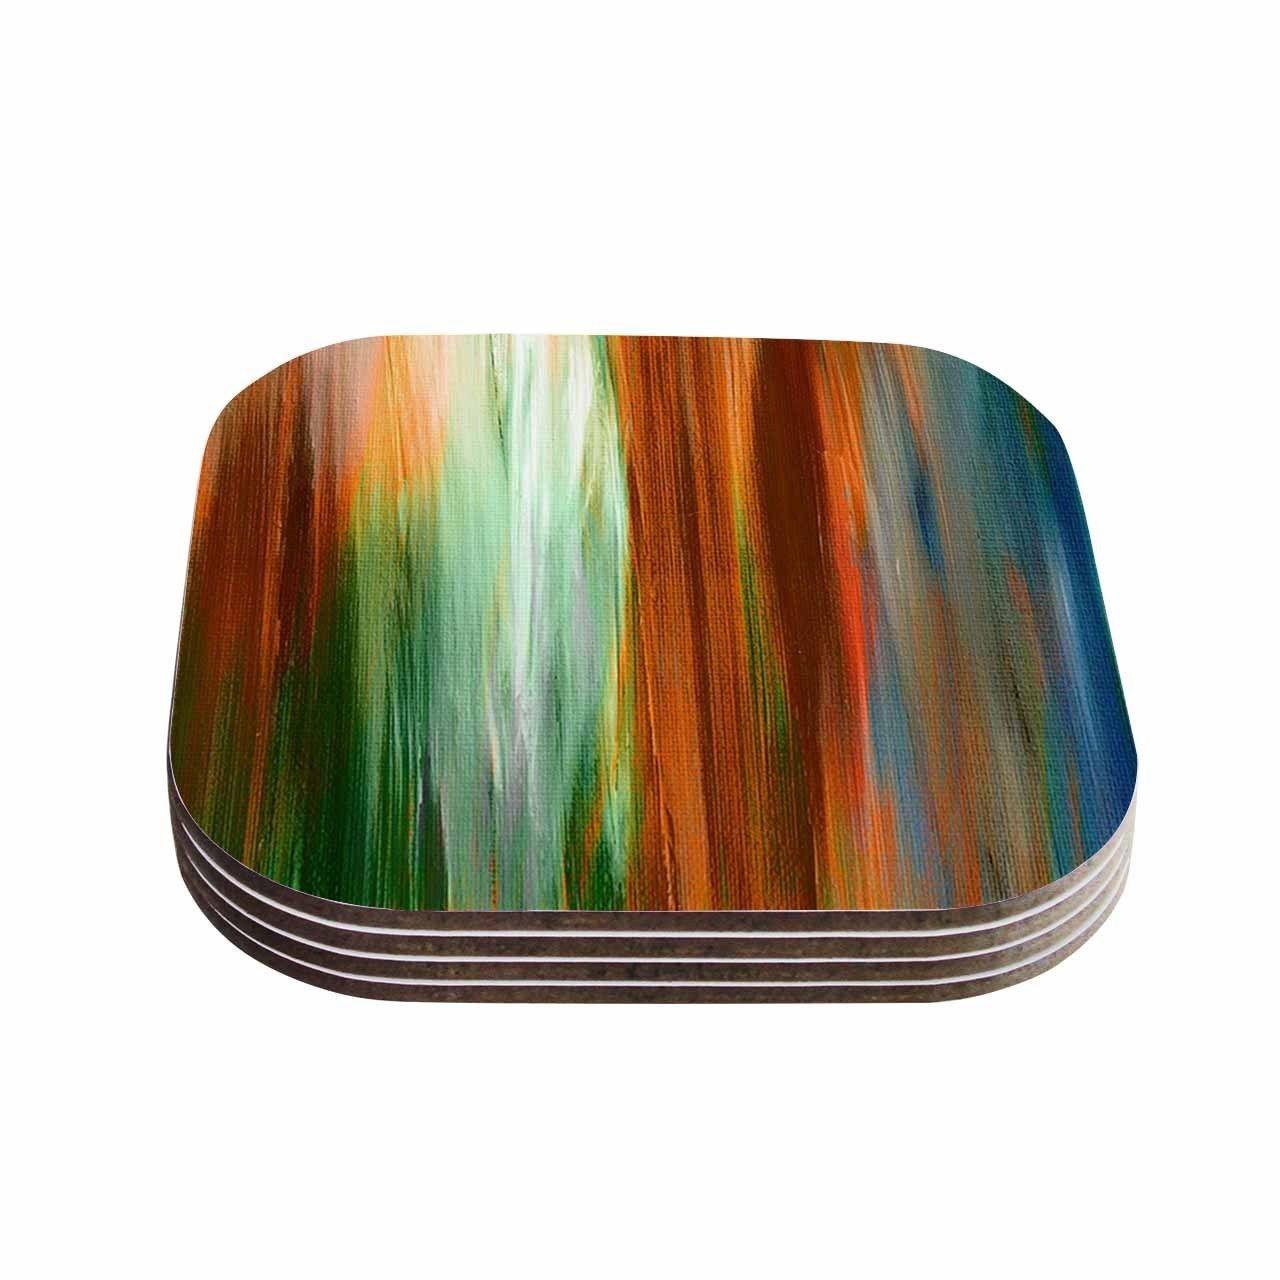 Kess InHouse Ebi Emporium 'Irradiated 4' Brown Green Coasters (Set of 4) (Irradiated 4) (Wood)